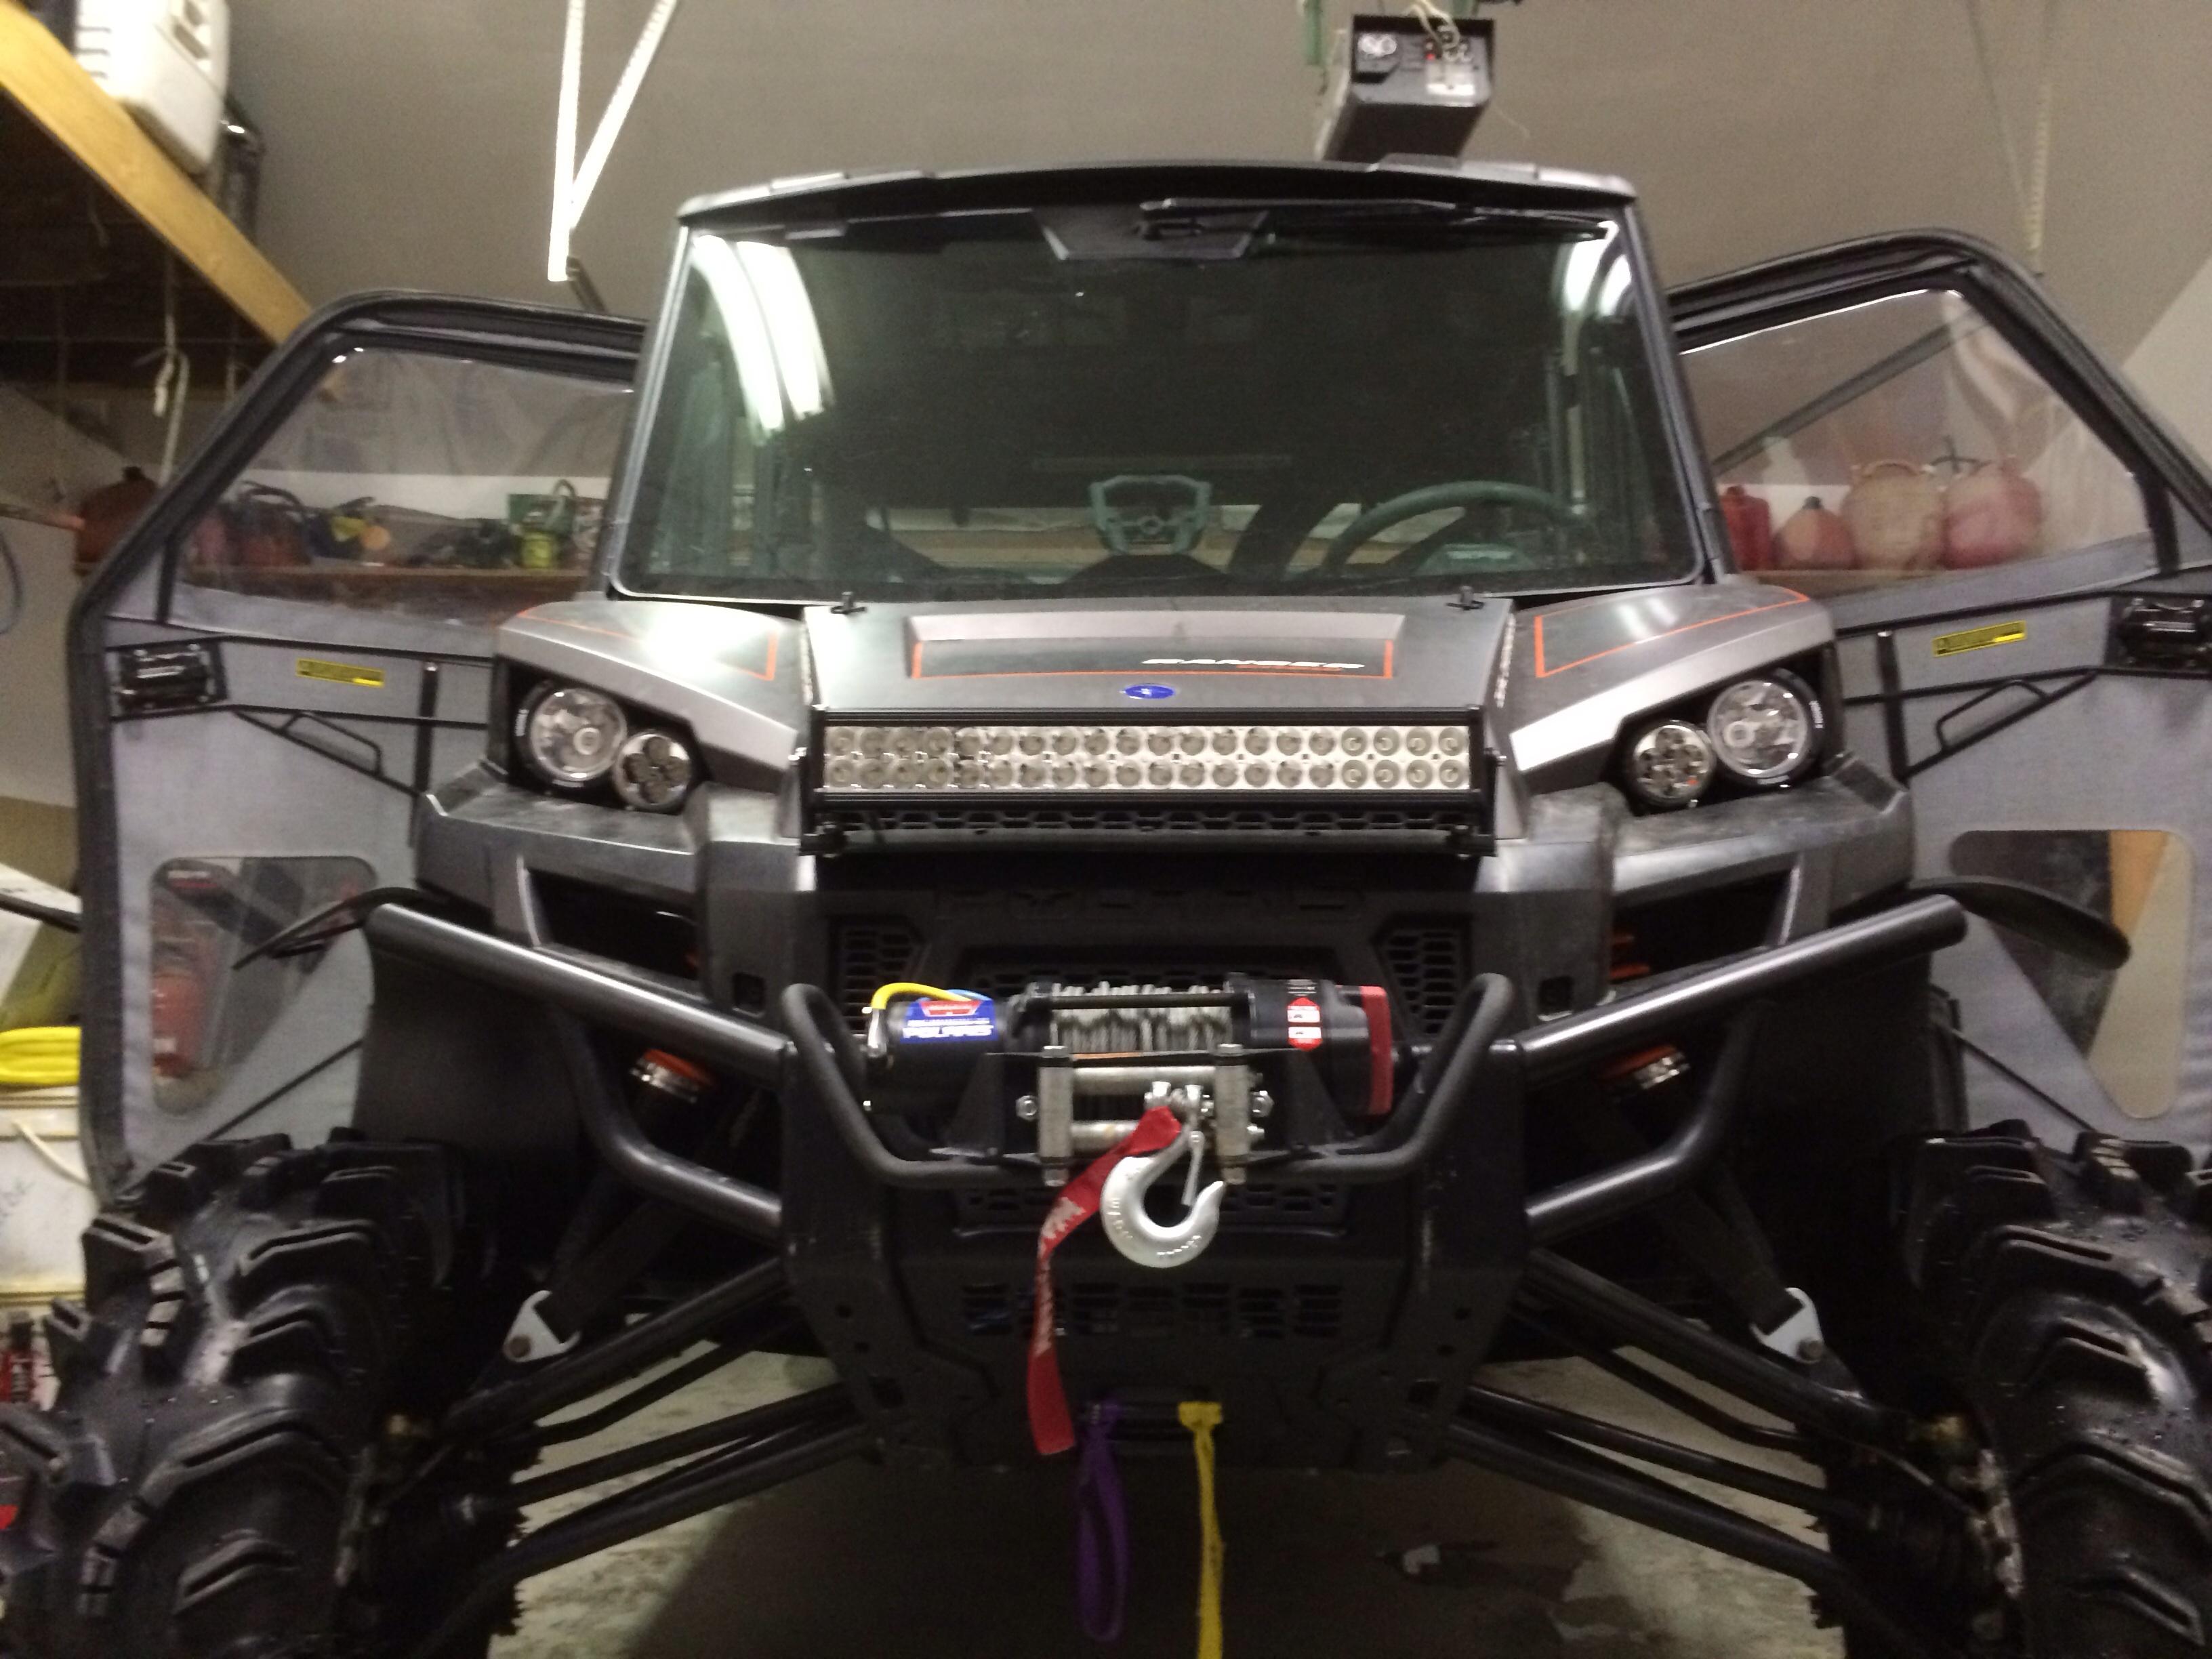 Ranger 2013 900xp Led Headlights